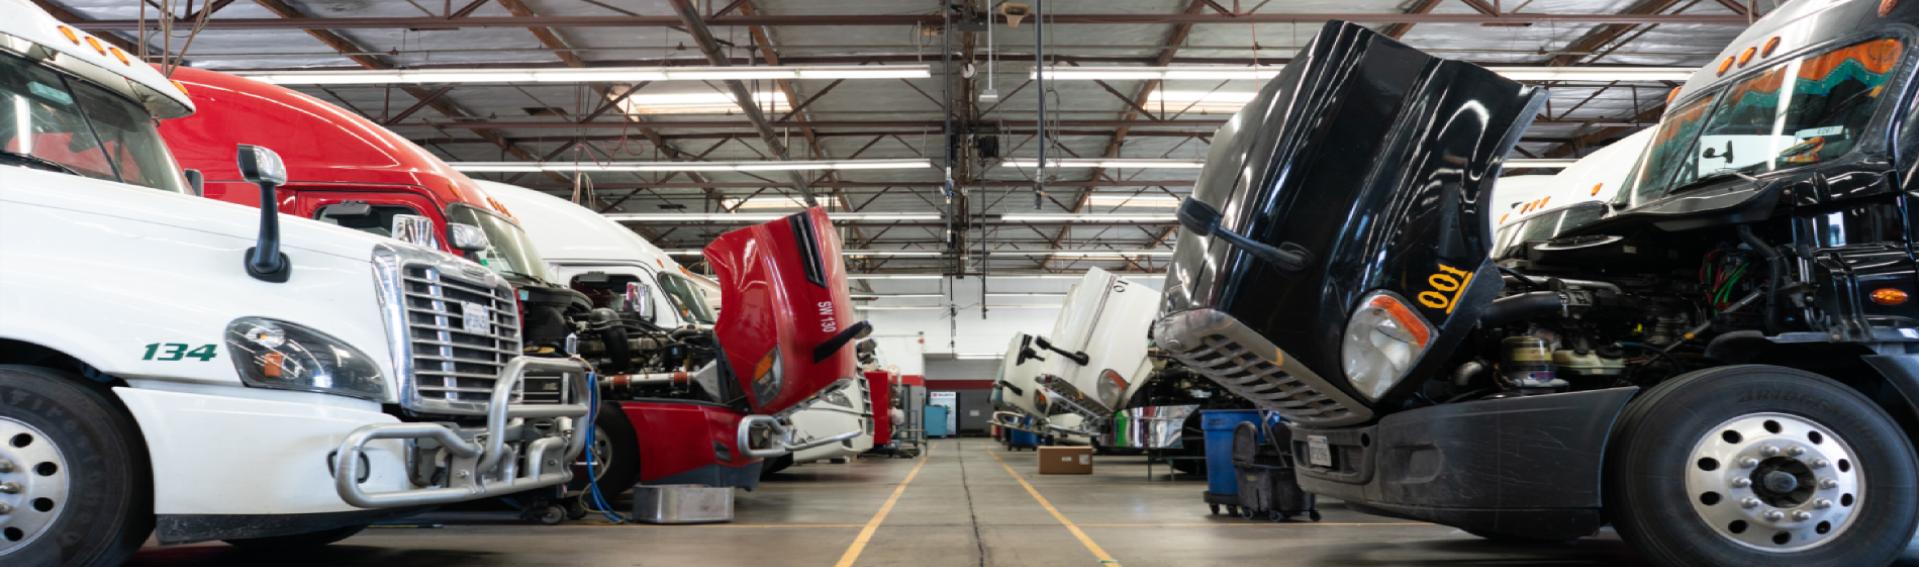 Ferguson Truck Center Provides Superior Advantage Over Dealership Fleet Services